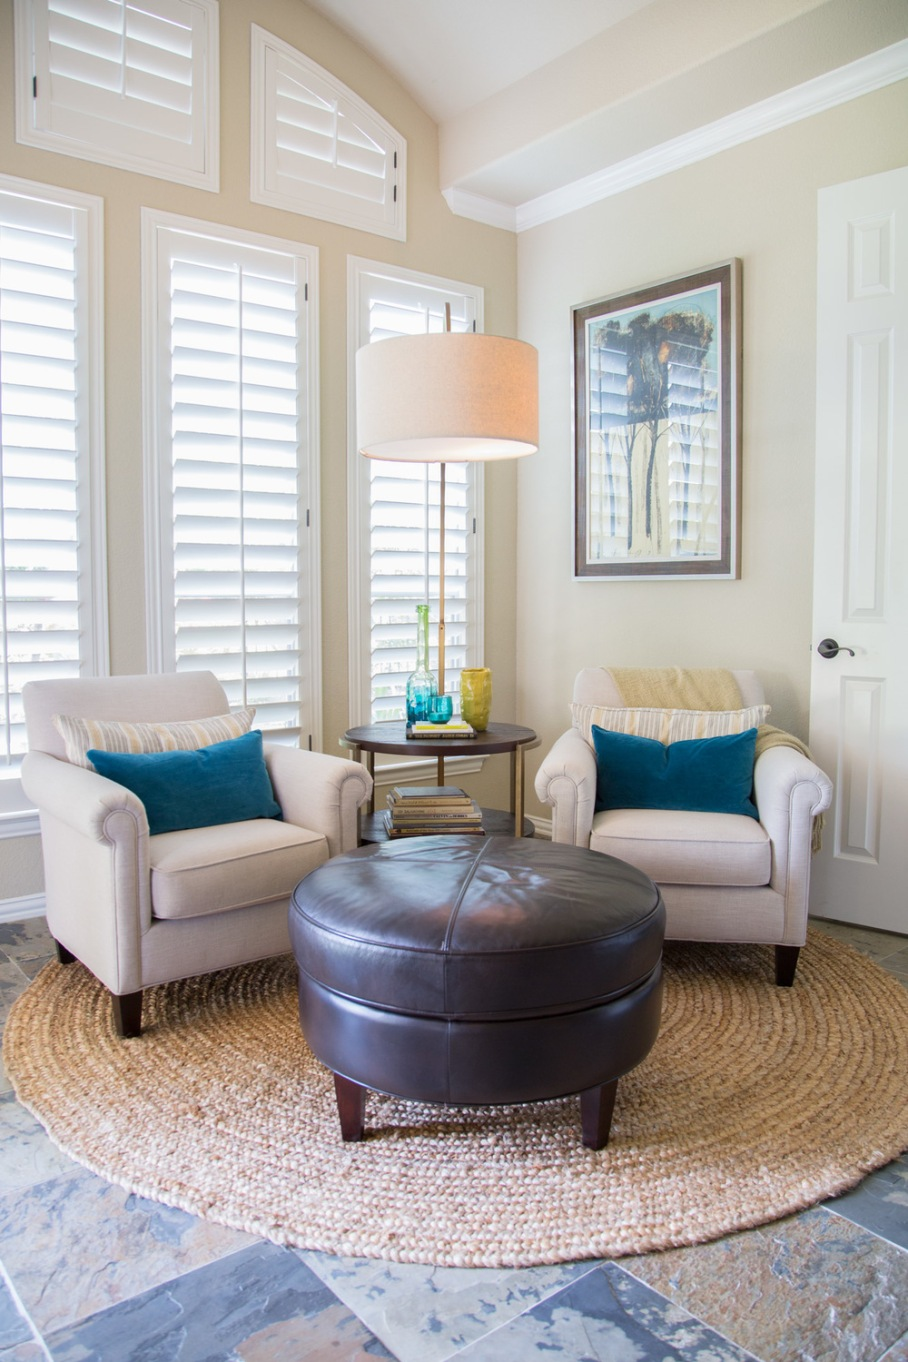 Sitting room remodel; rug; table; decor; chair; lamp / lighting | Interior Designer: Carla Aston / Photography by Tori Aston